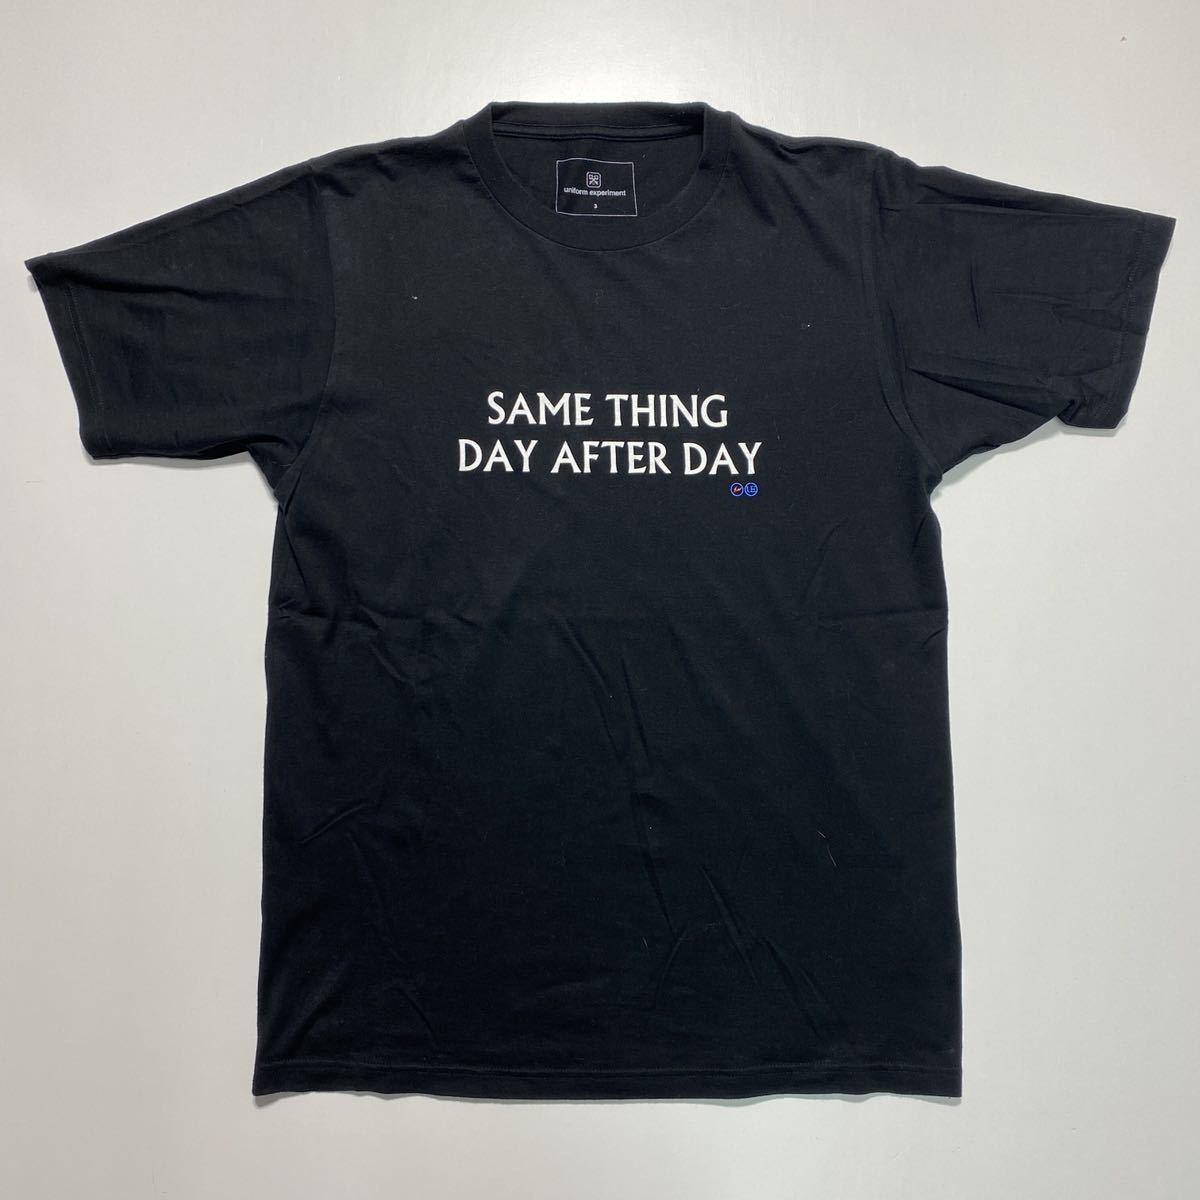 【3】uniform experiment Fragment design Tee ユニフォーム エクスペリメント フラグメントデザイン Tシャツ ブラック G485_画像1